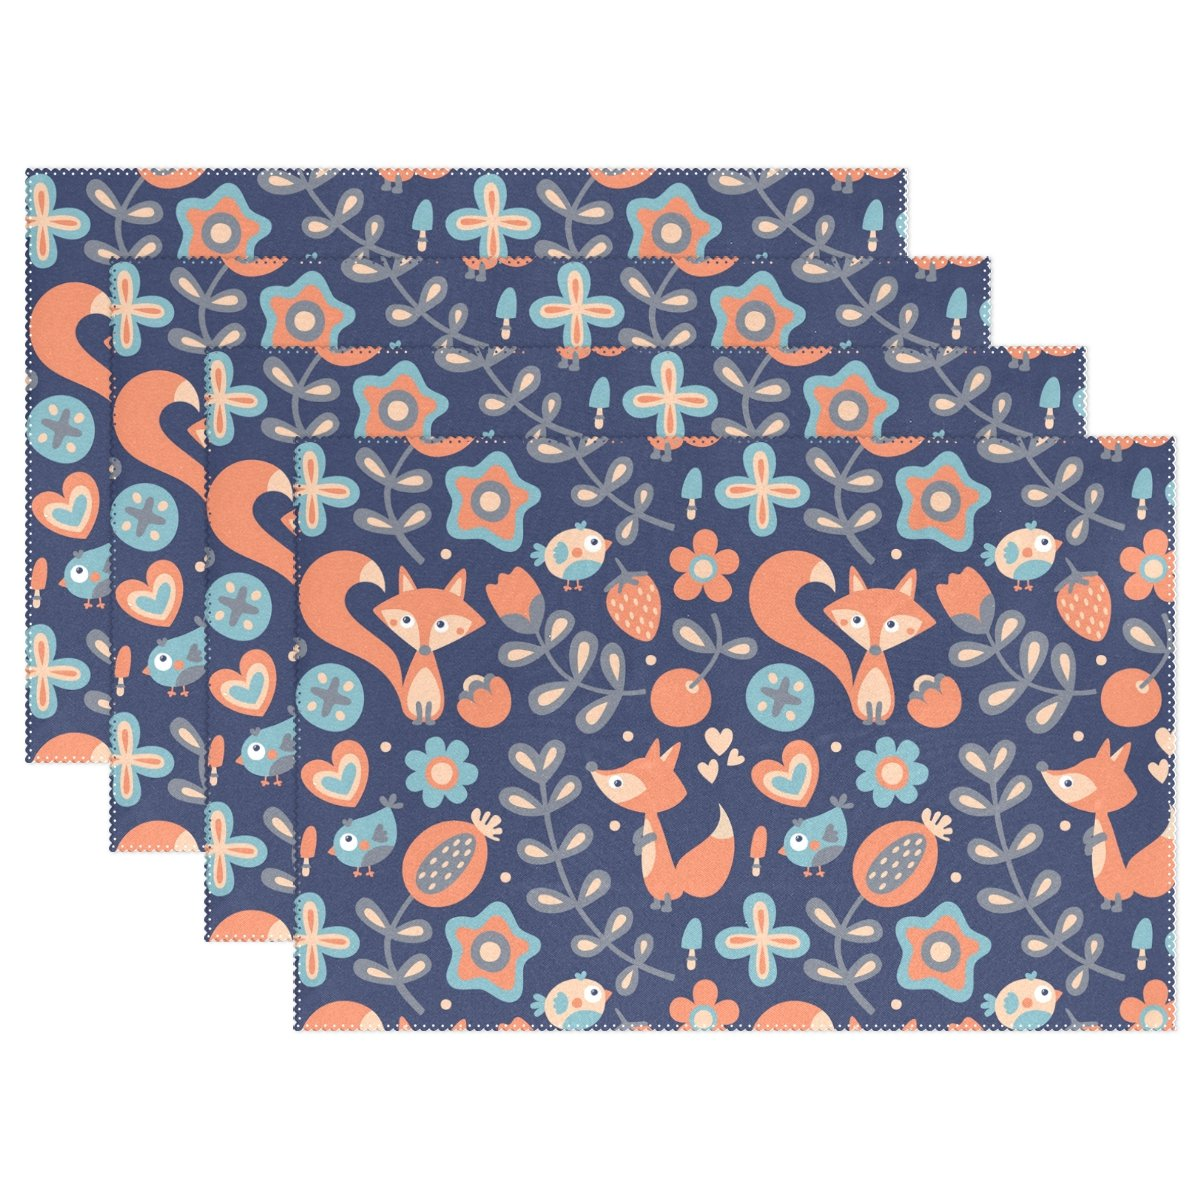 Wozo Spring Floral Bird Foxプレースマットテーブルマット、ストロベリーラブハート12